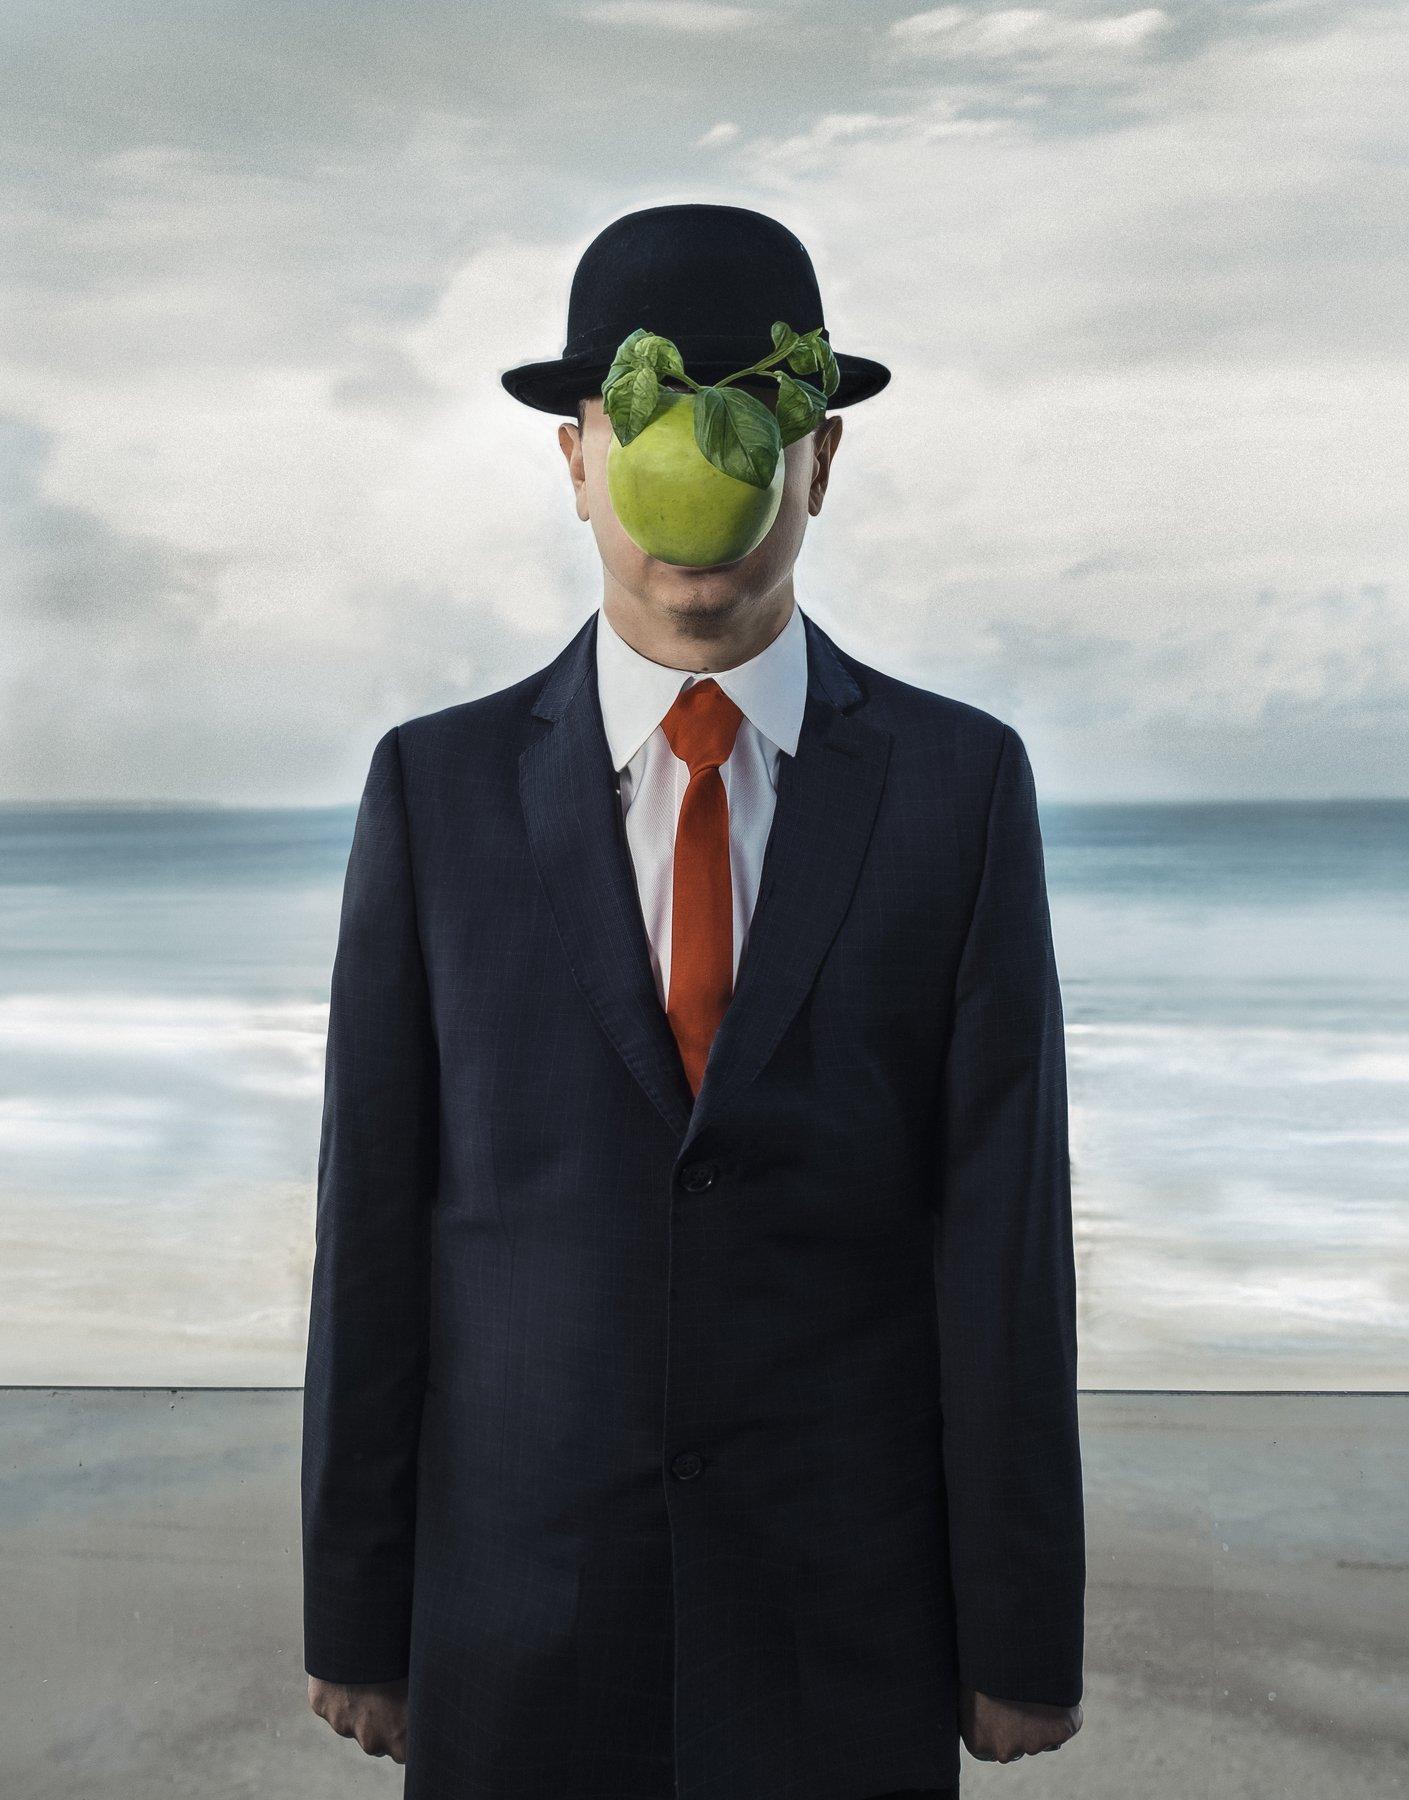 Магритт Рене, картина с яблоком, аллюзия на живопись, Маргарита Орбелян